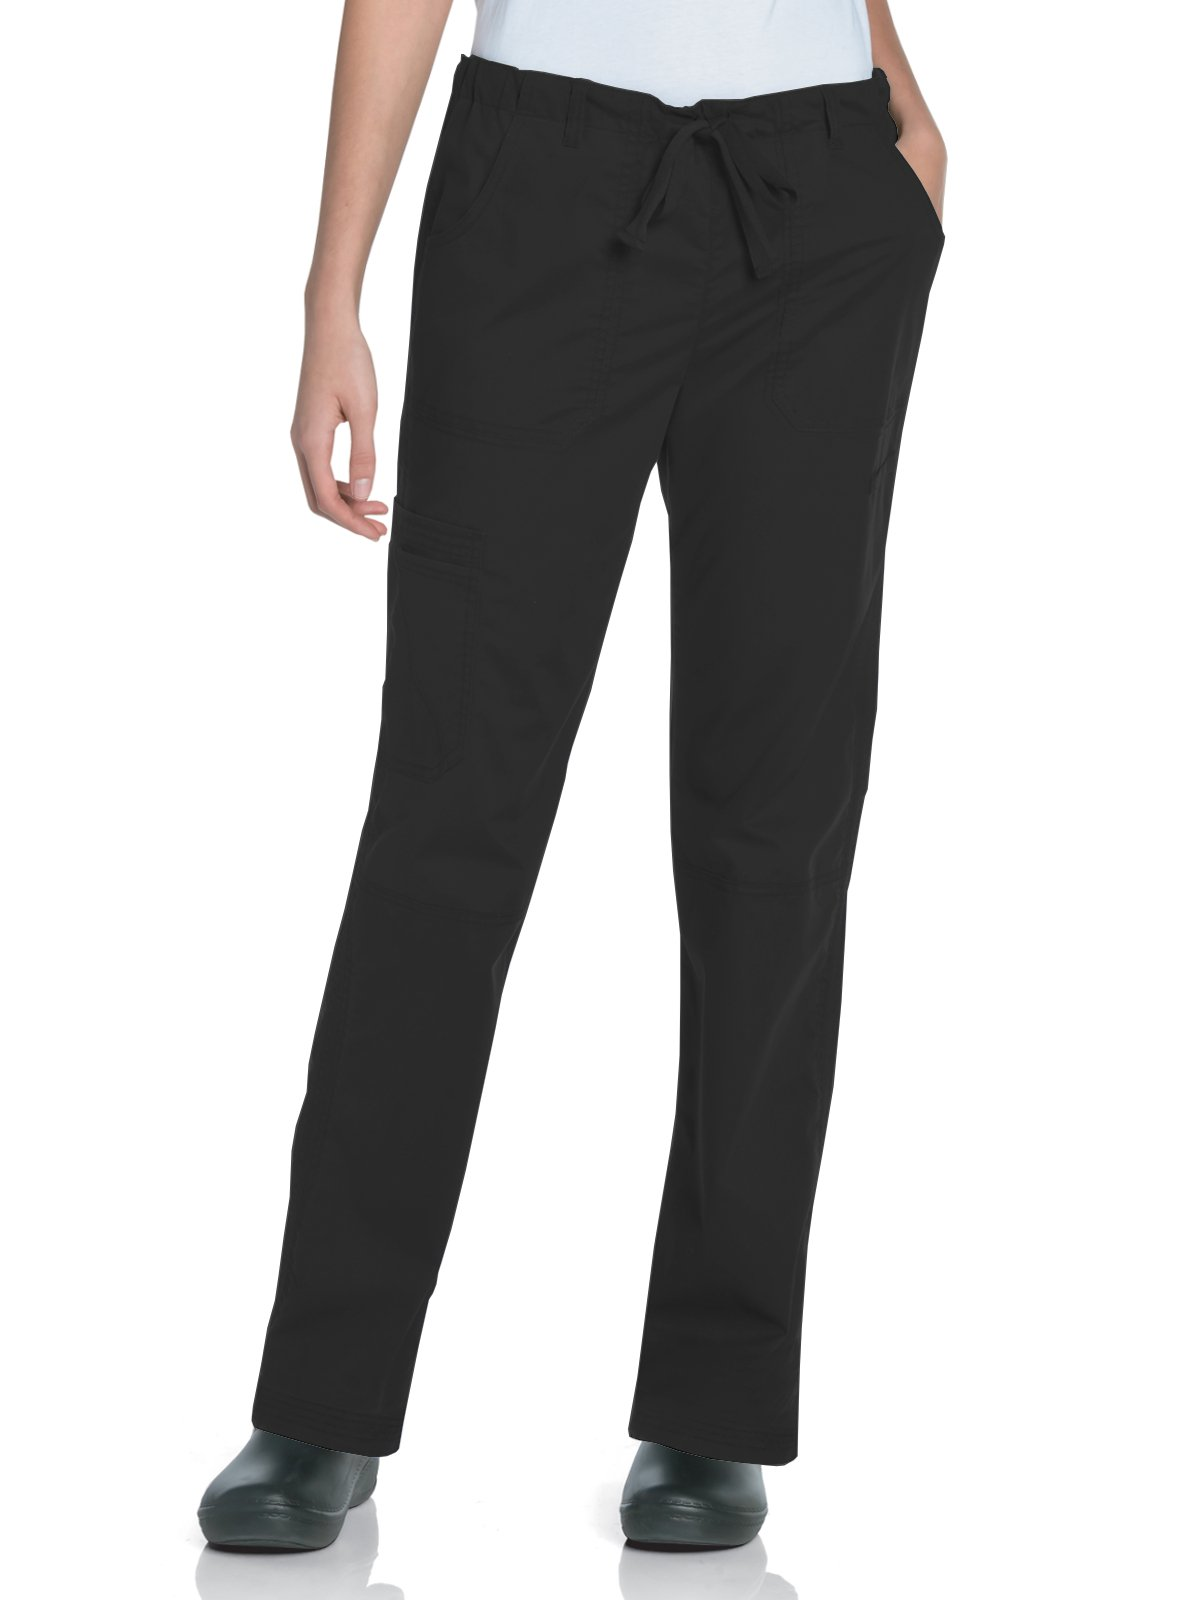 Landau Women's Pre-Washed Cargo Scrub Pant, Black, Medium